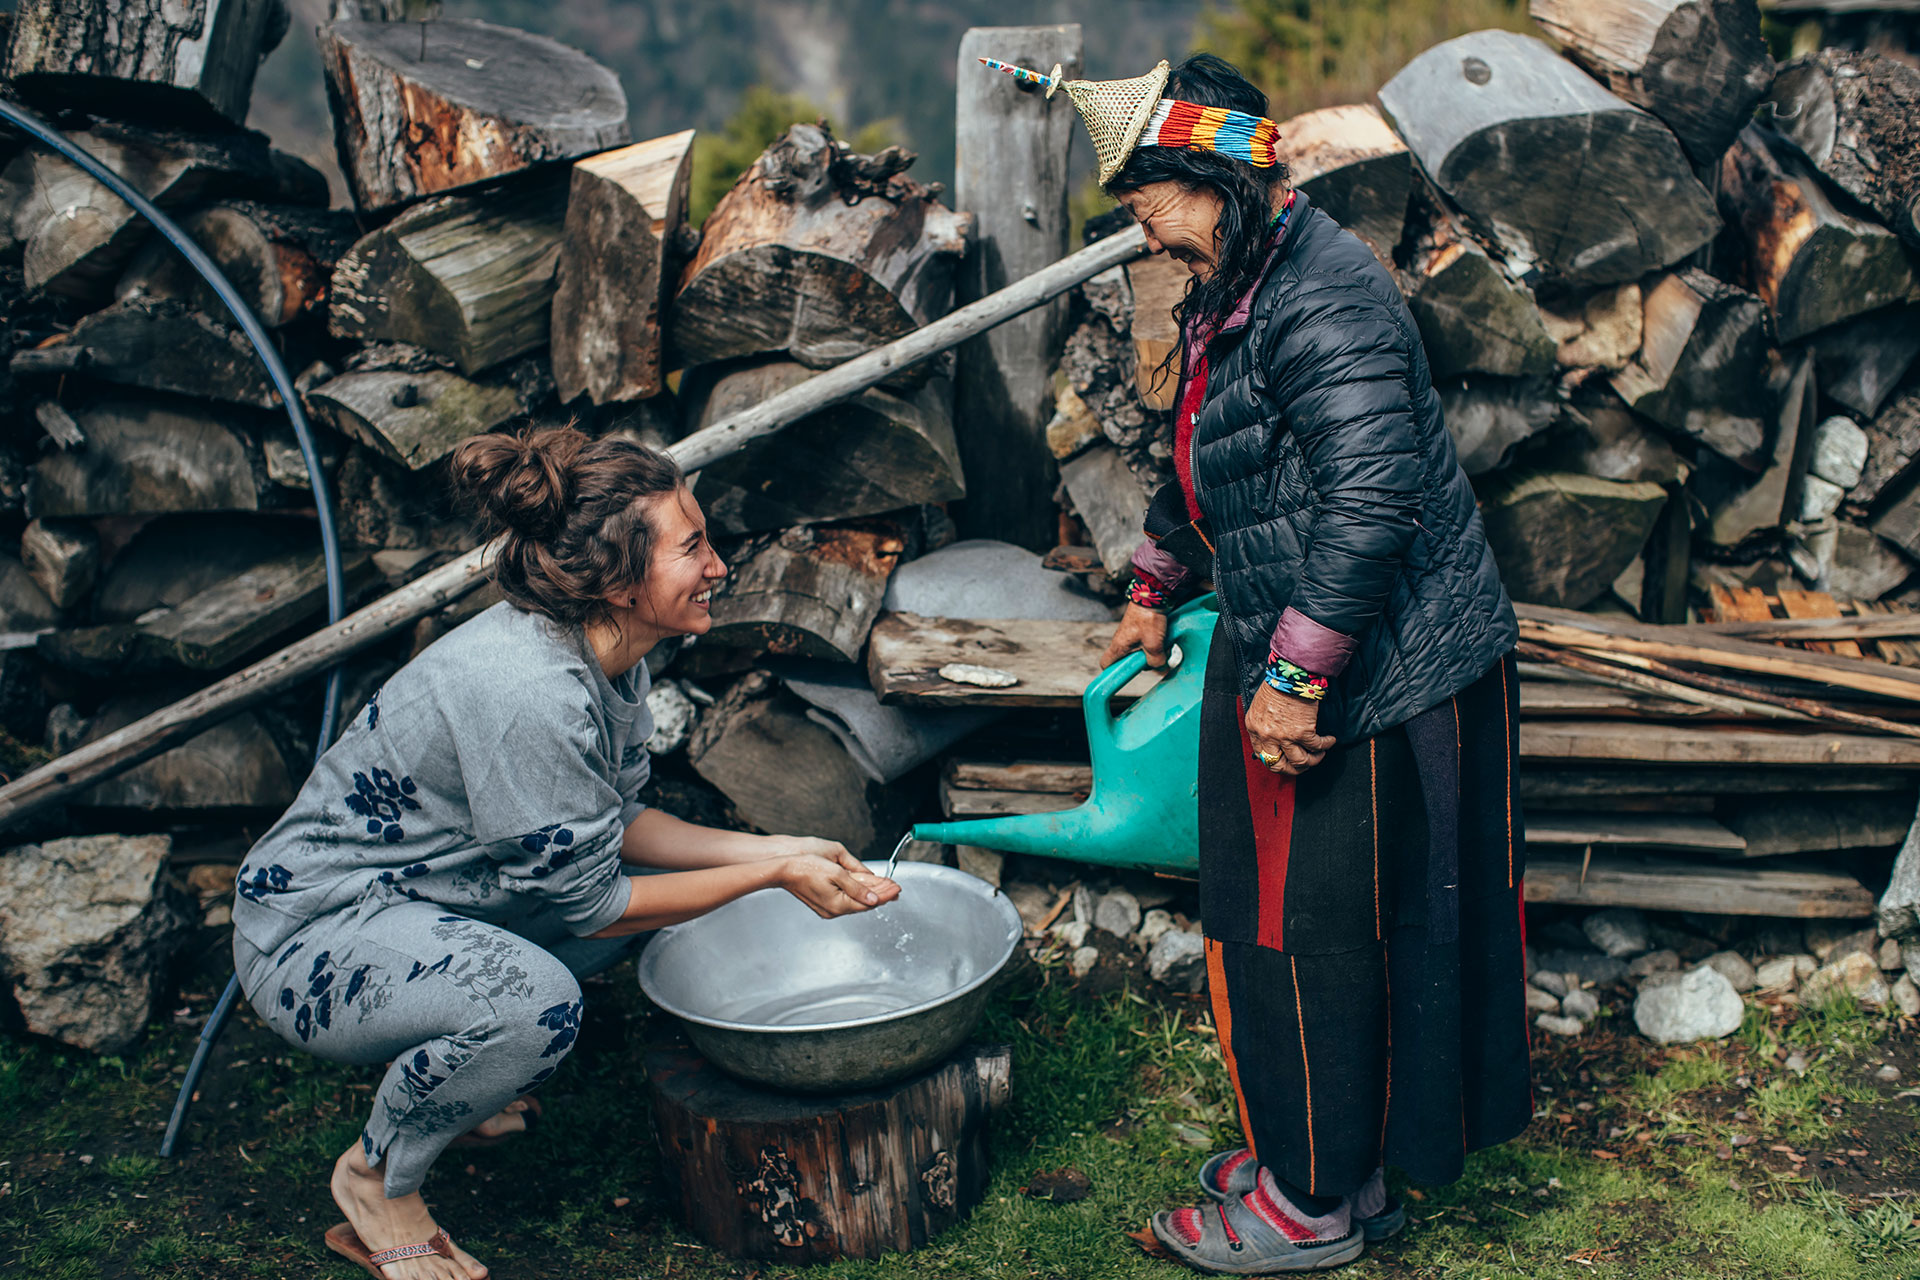 People Fotoreise Produktion Trekking Lifestyle Kultur Outdoor